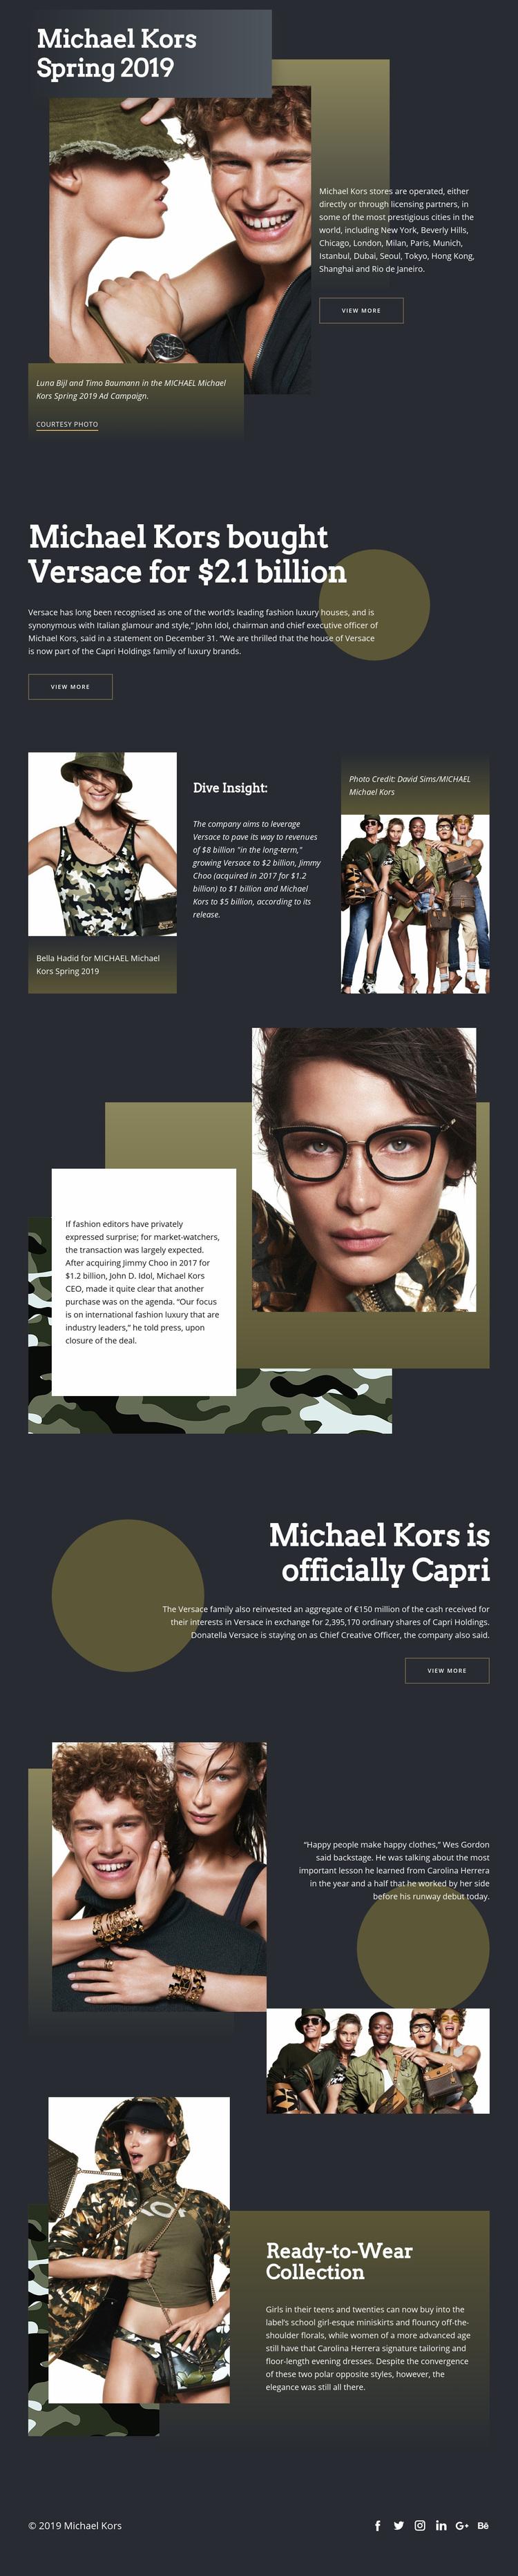 Michael Kors Dark Web Page Designer